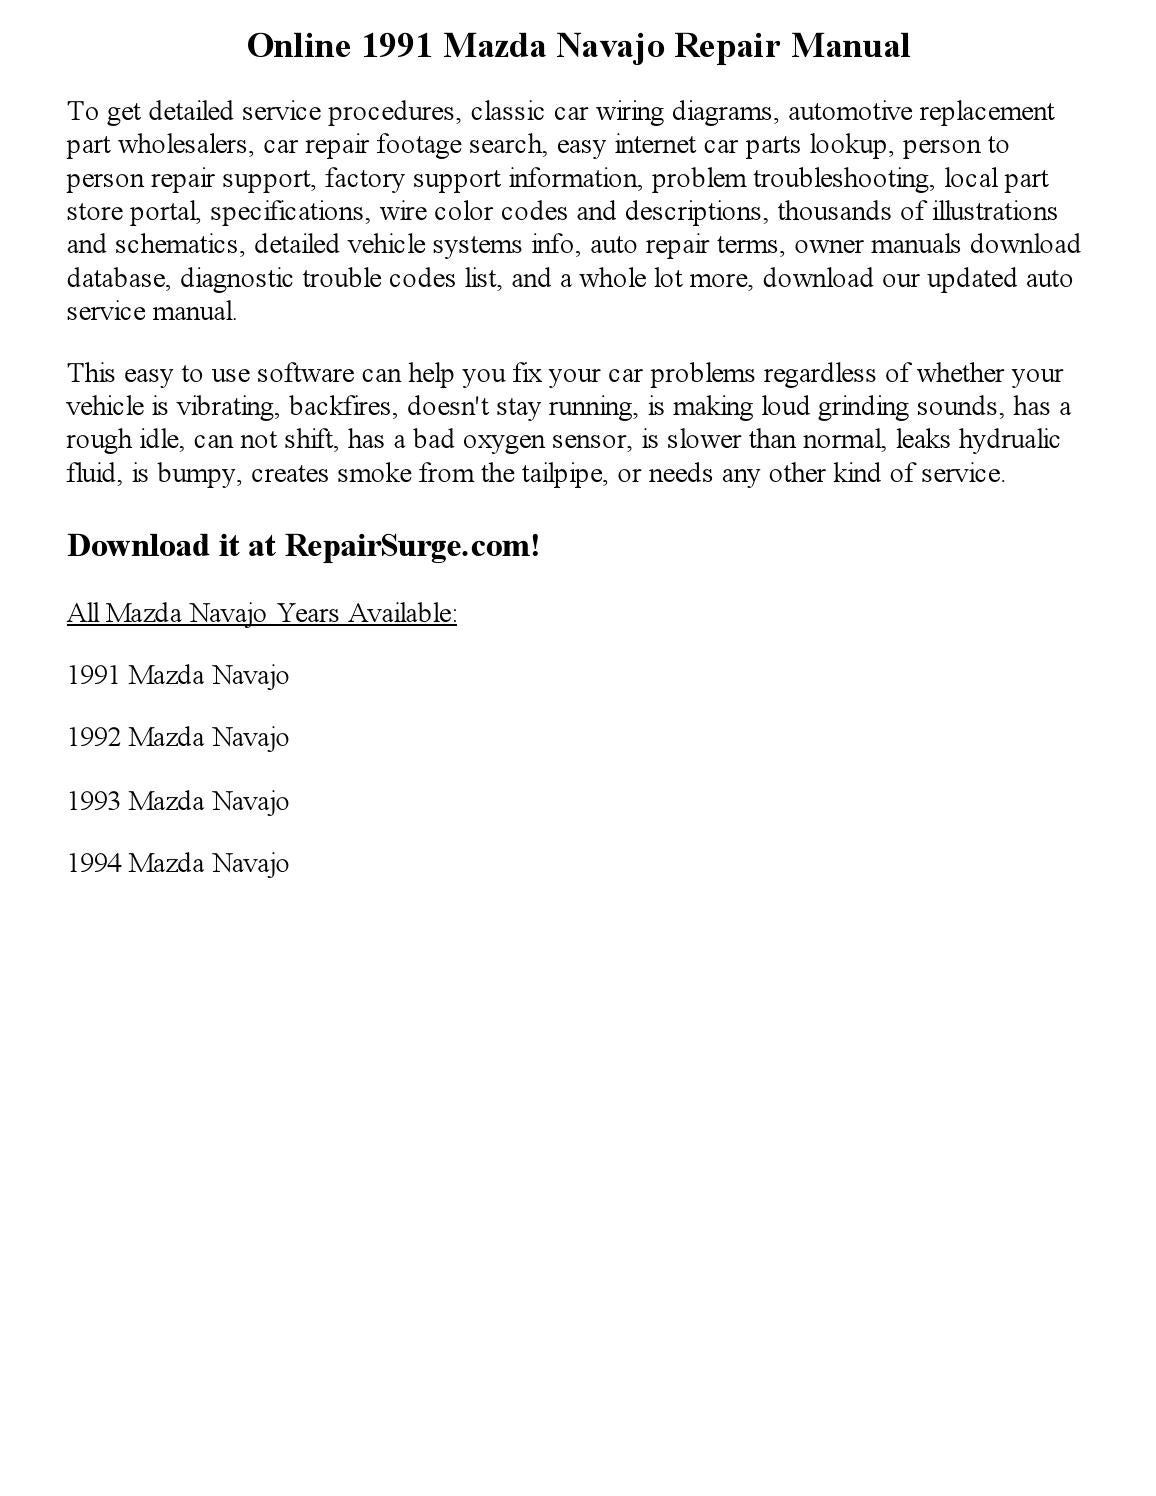 mazda wiring diagram color codes 2000 pontiac grand prix gtp radio 1991 navajo repair manual online by glen d charron